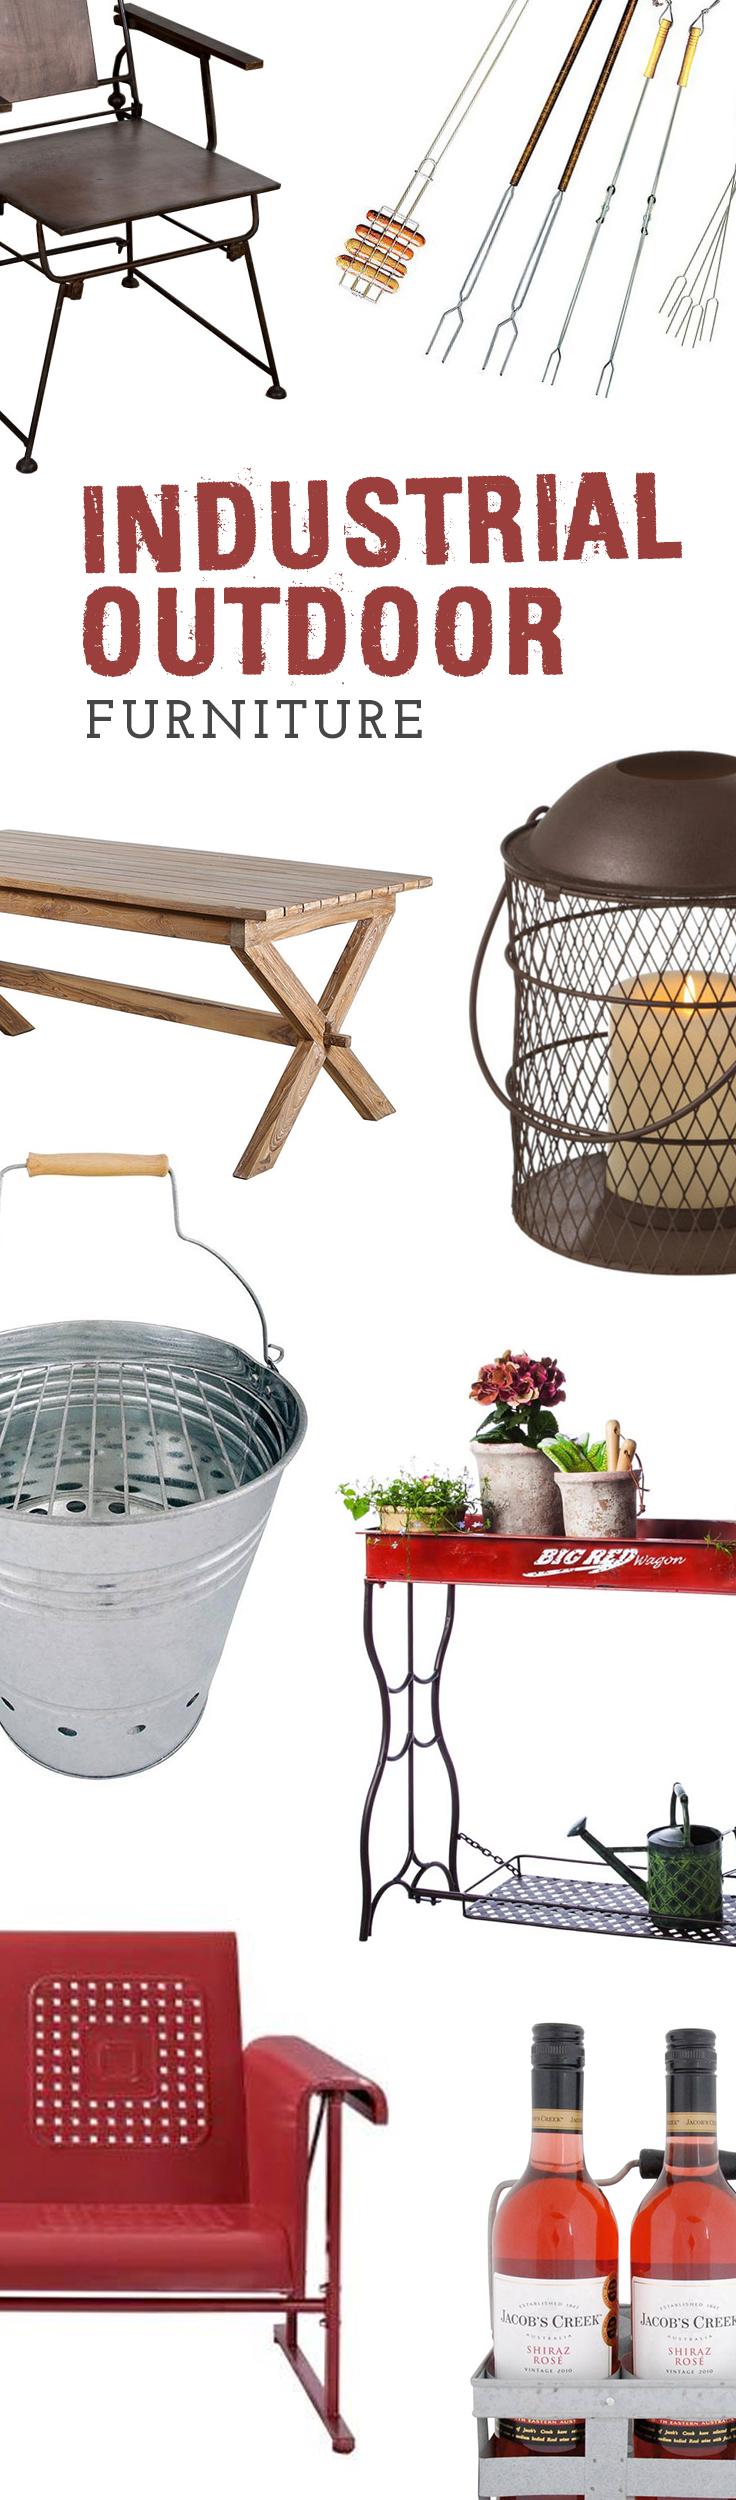 industrial outdoor furniture dcor shop now at dotandbocom